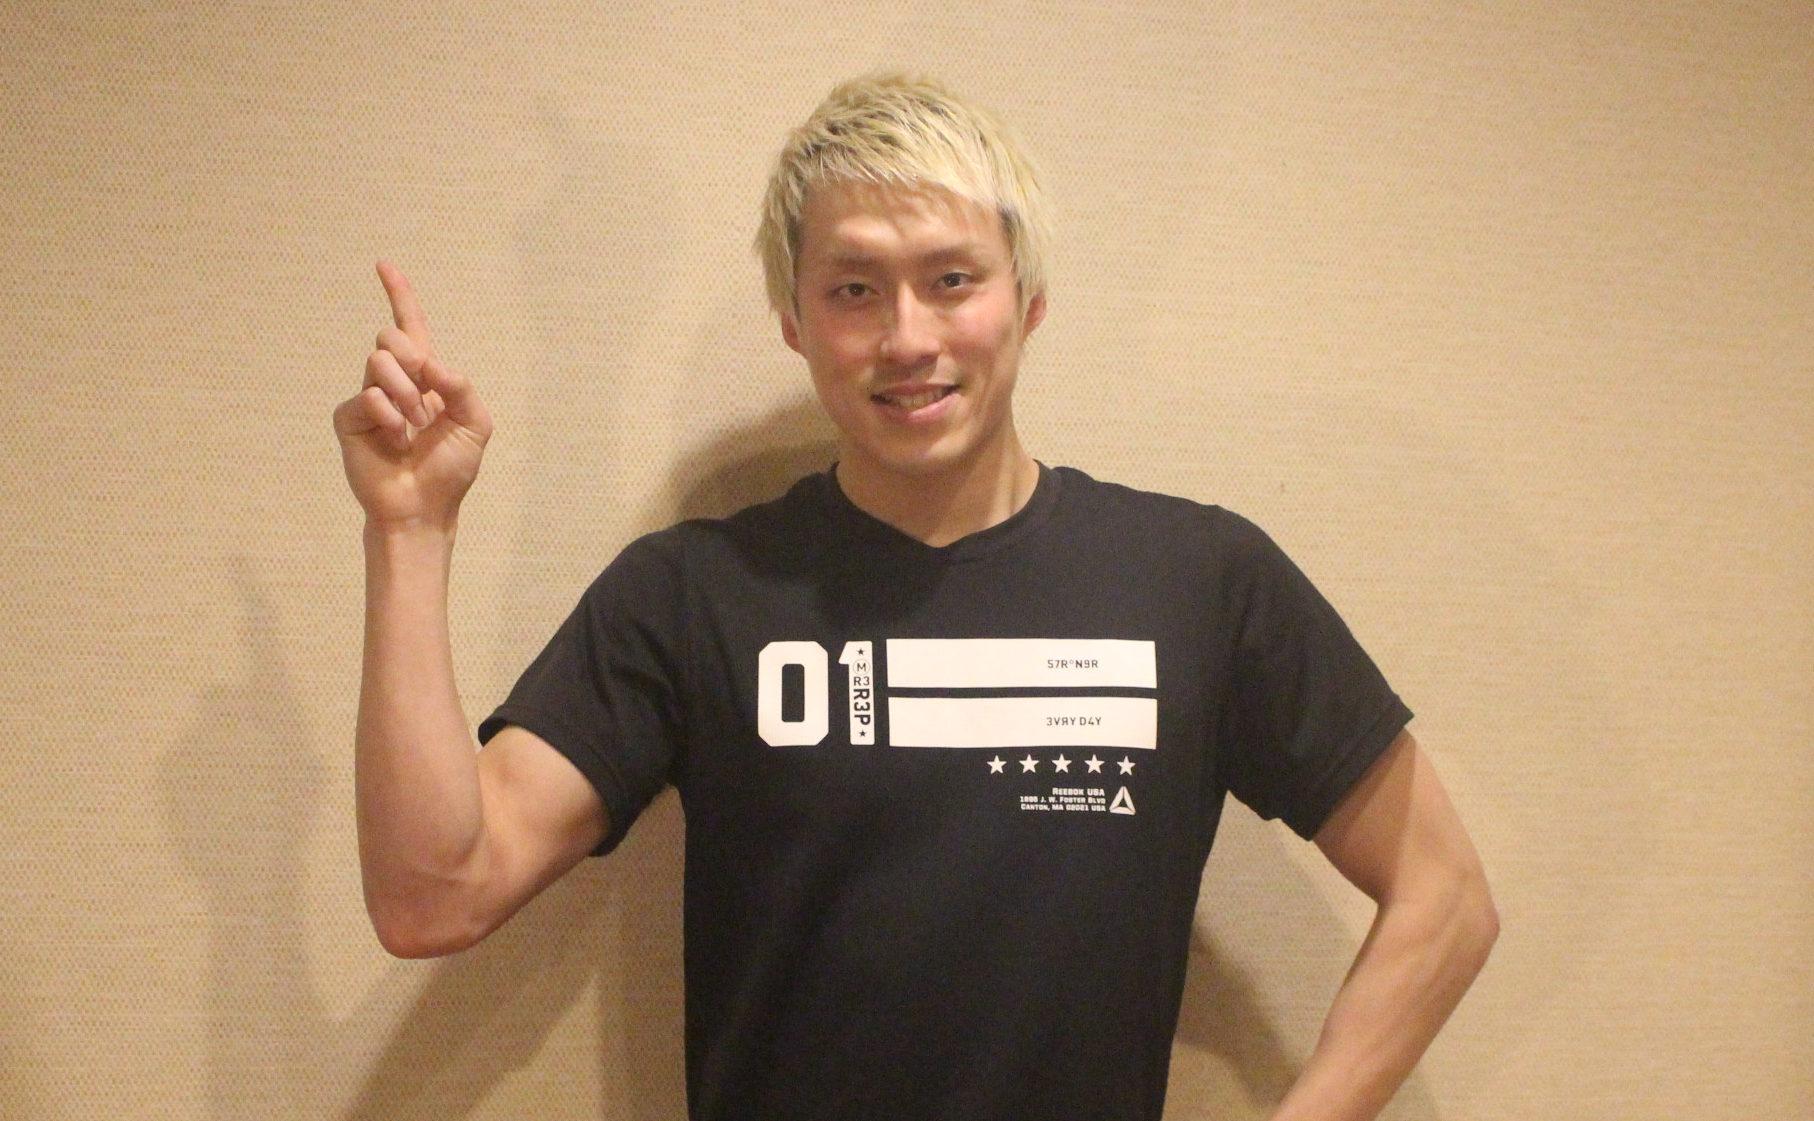 Konスポーツ塾 菊池先生